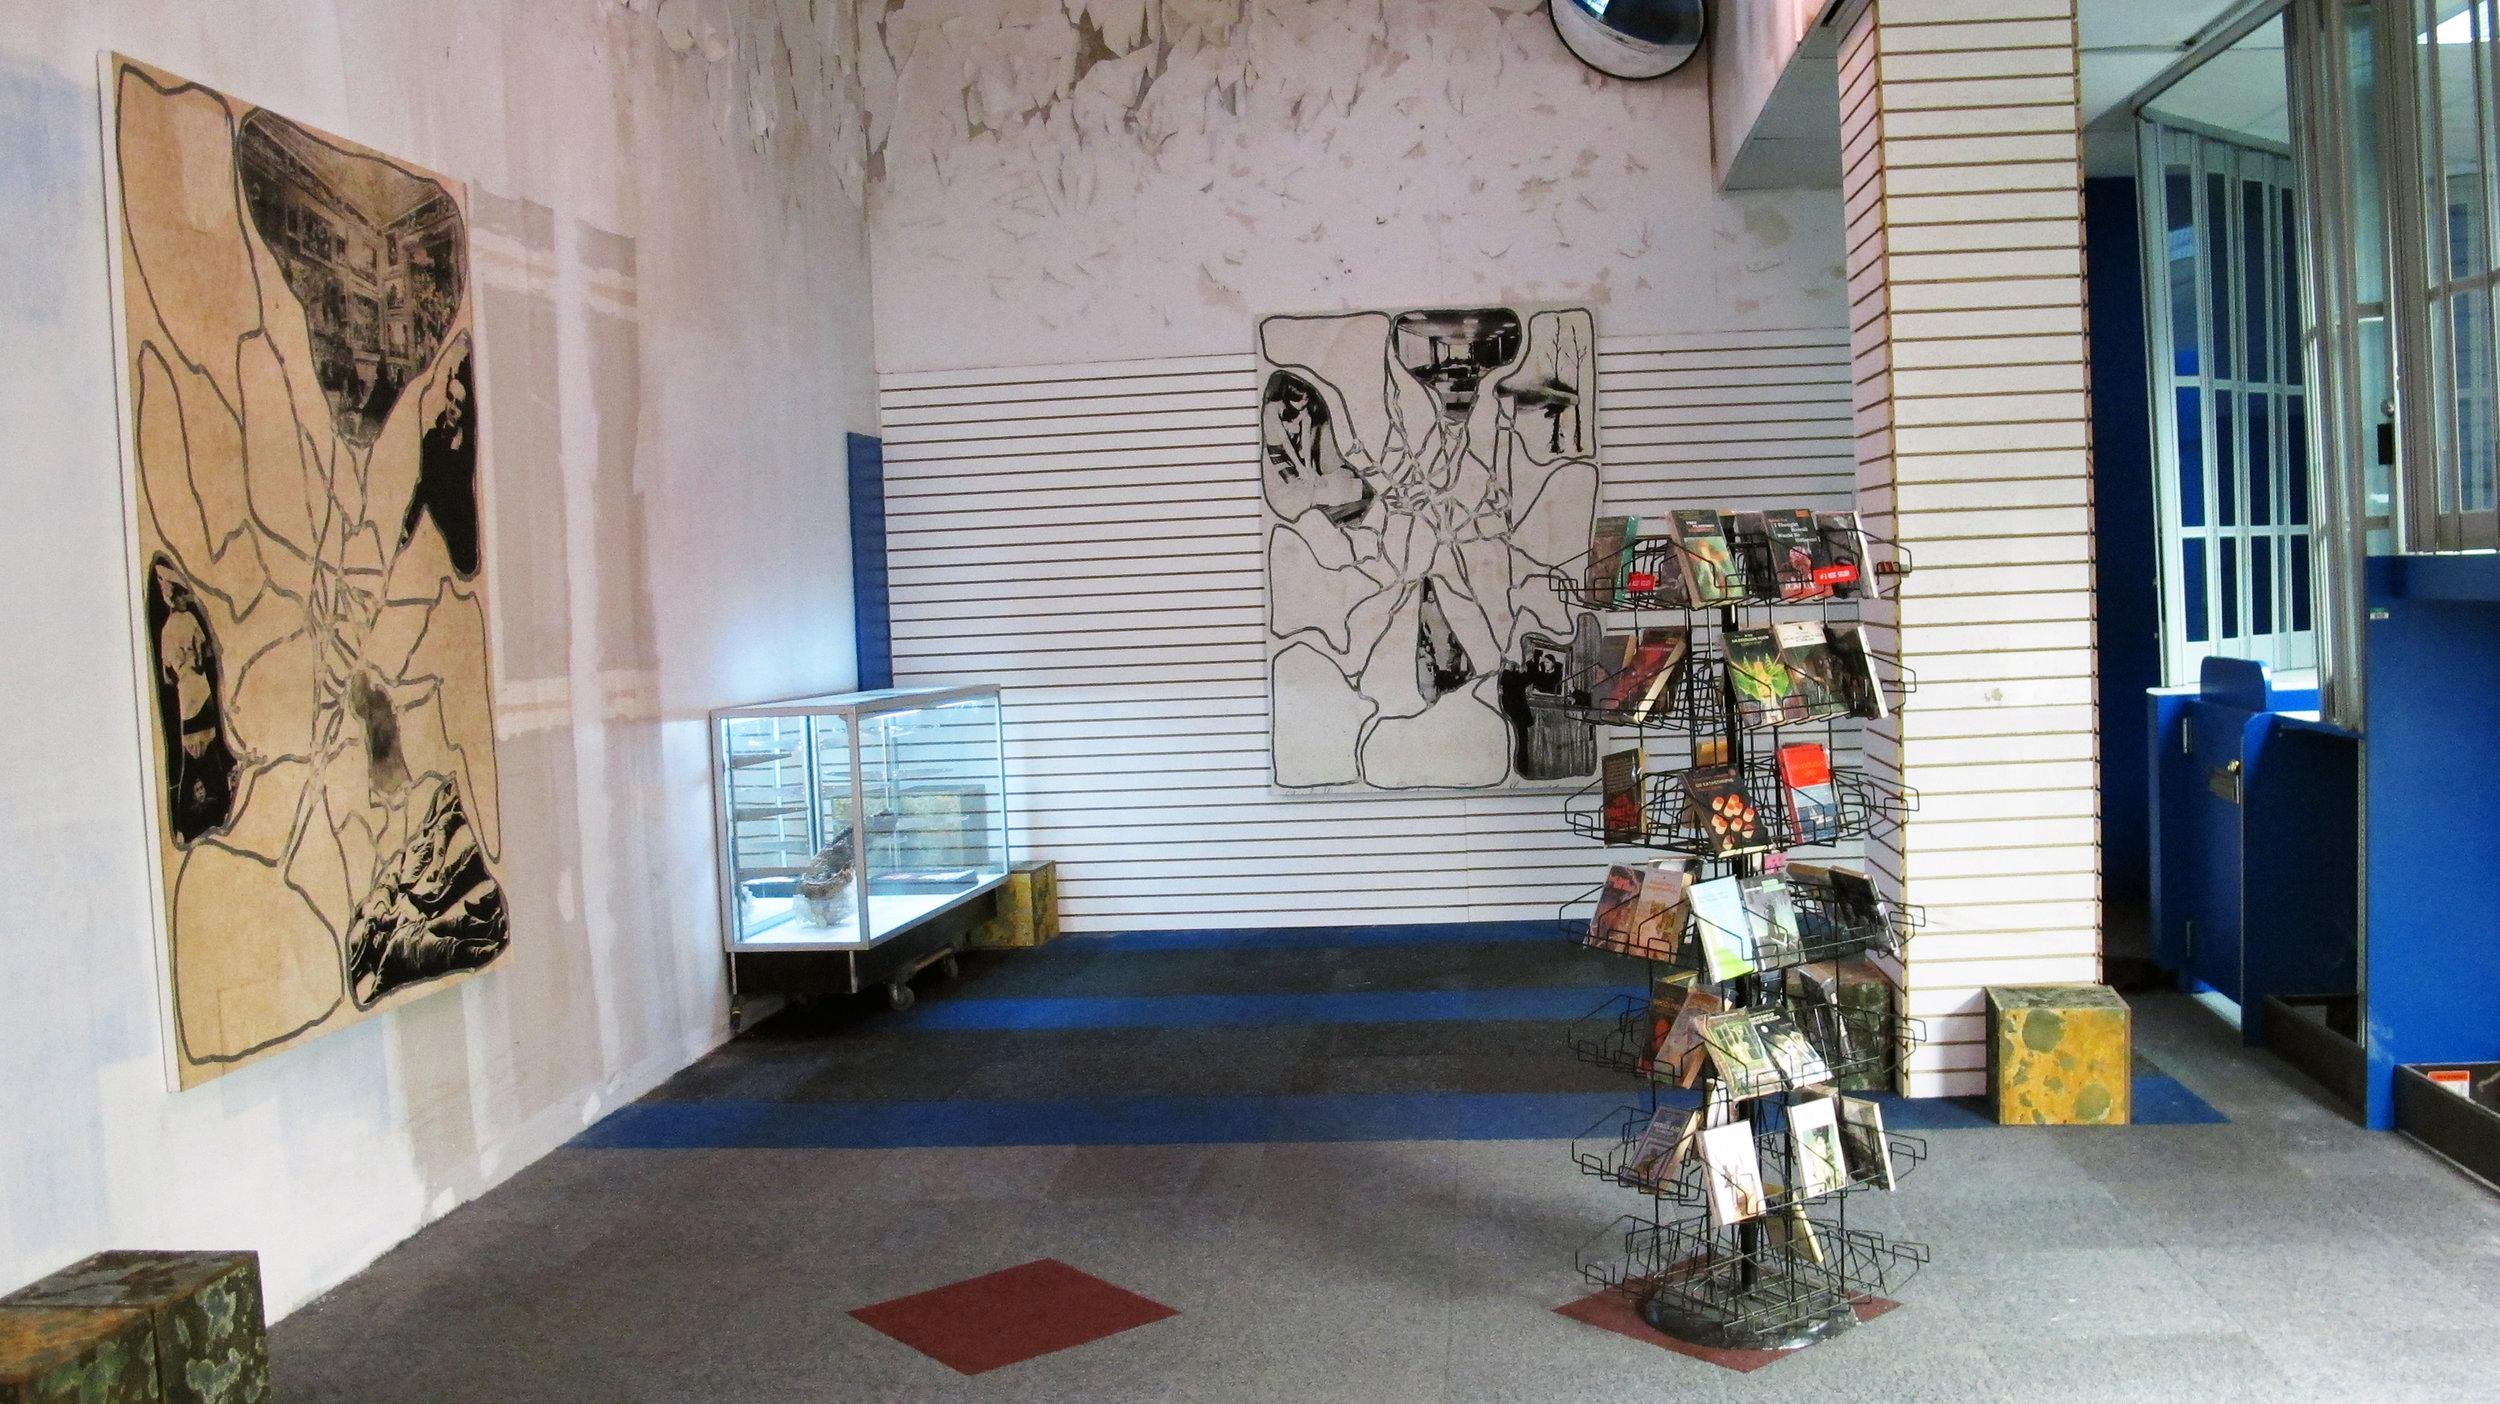 Freeman-Lowe, PANOPTICUM, Robert Miller Gallery, Installation View 29.JPG